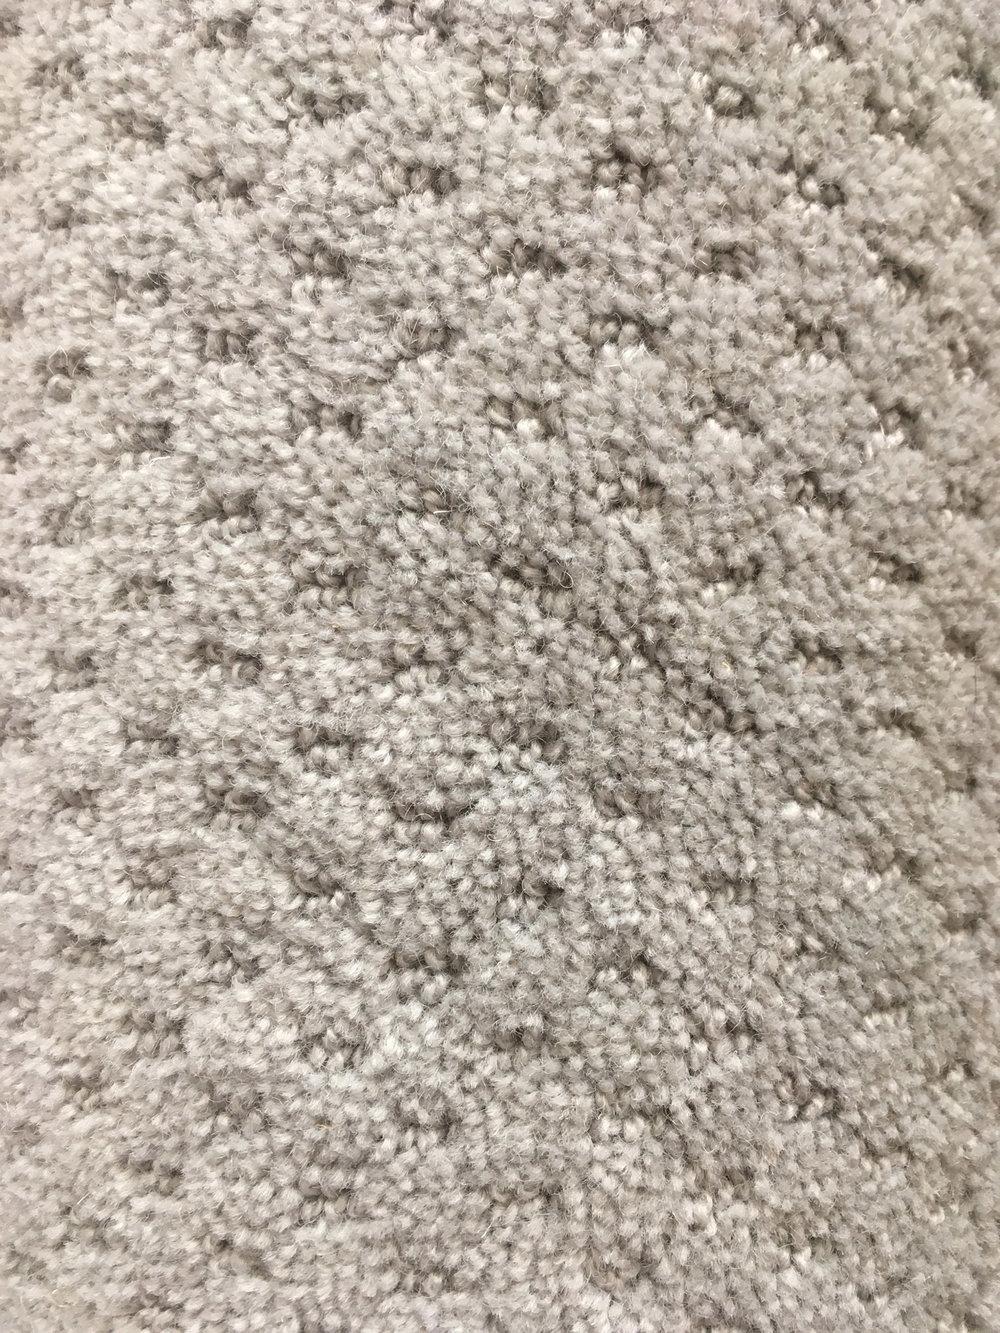 Dubai - Colour: Dove Grey100% PolypropoleneSize: 4.45 x 4.00MPrice: 202.56